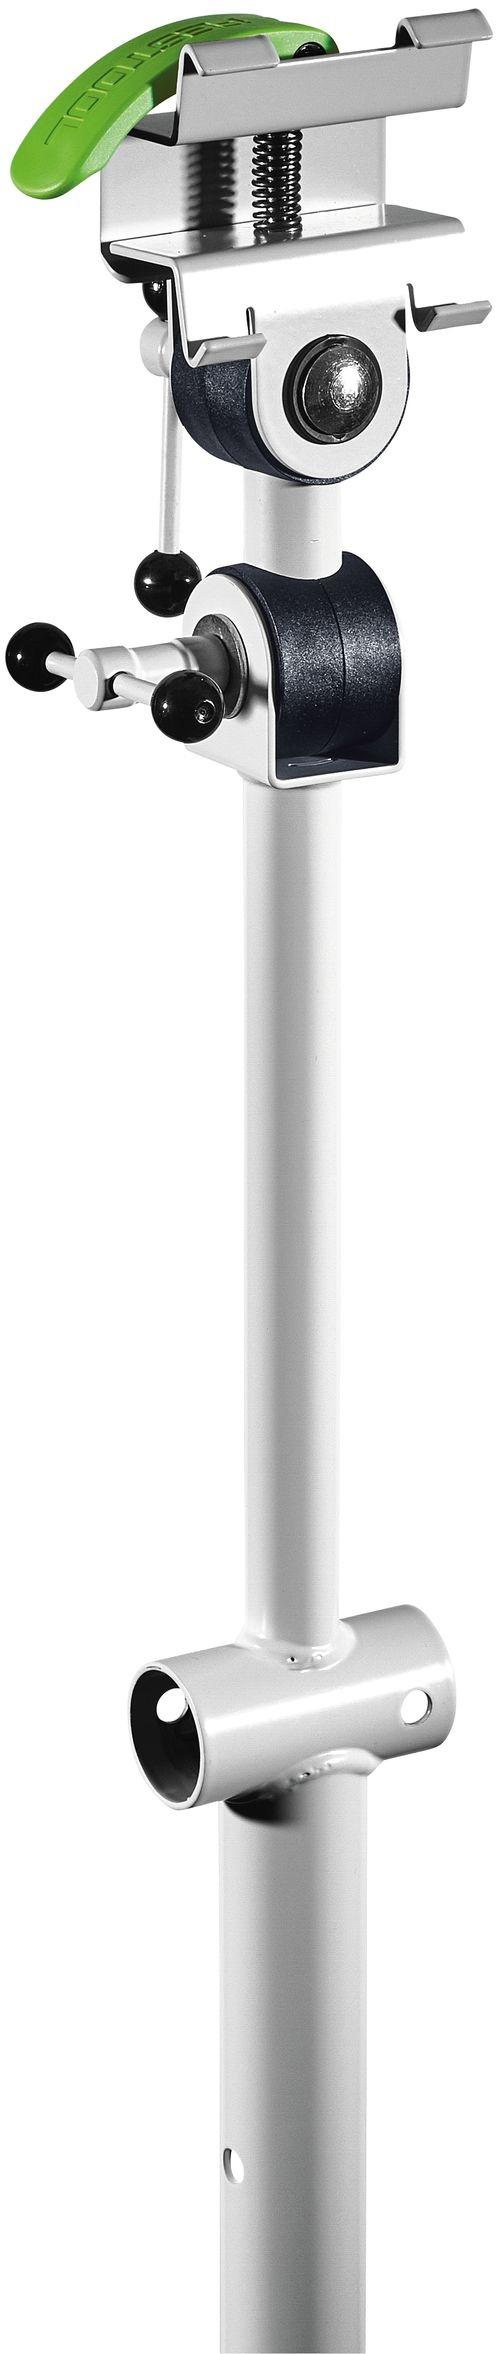 Festool Adaptér AD-ST DUO 200